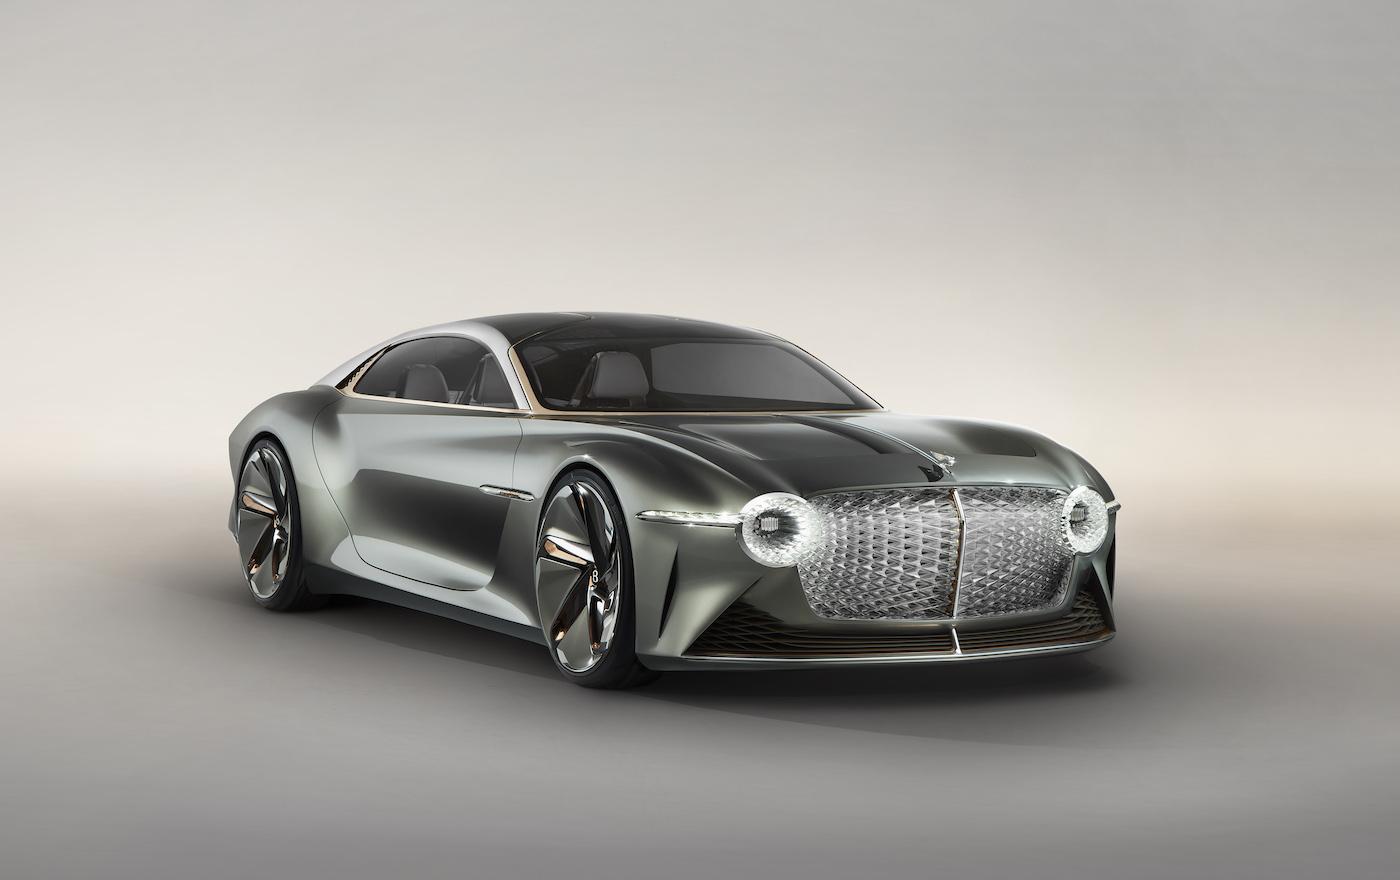 Bentley EXP 100 GT: Luxus-Studie zum 100-jährigen Jubiläum